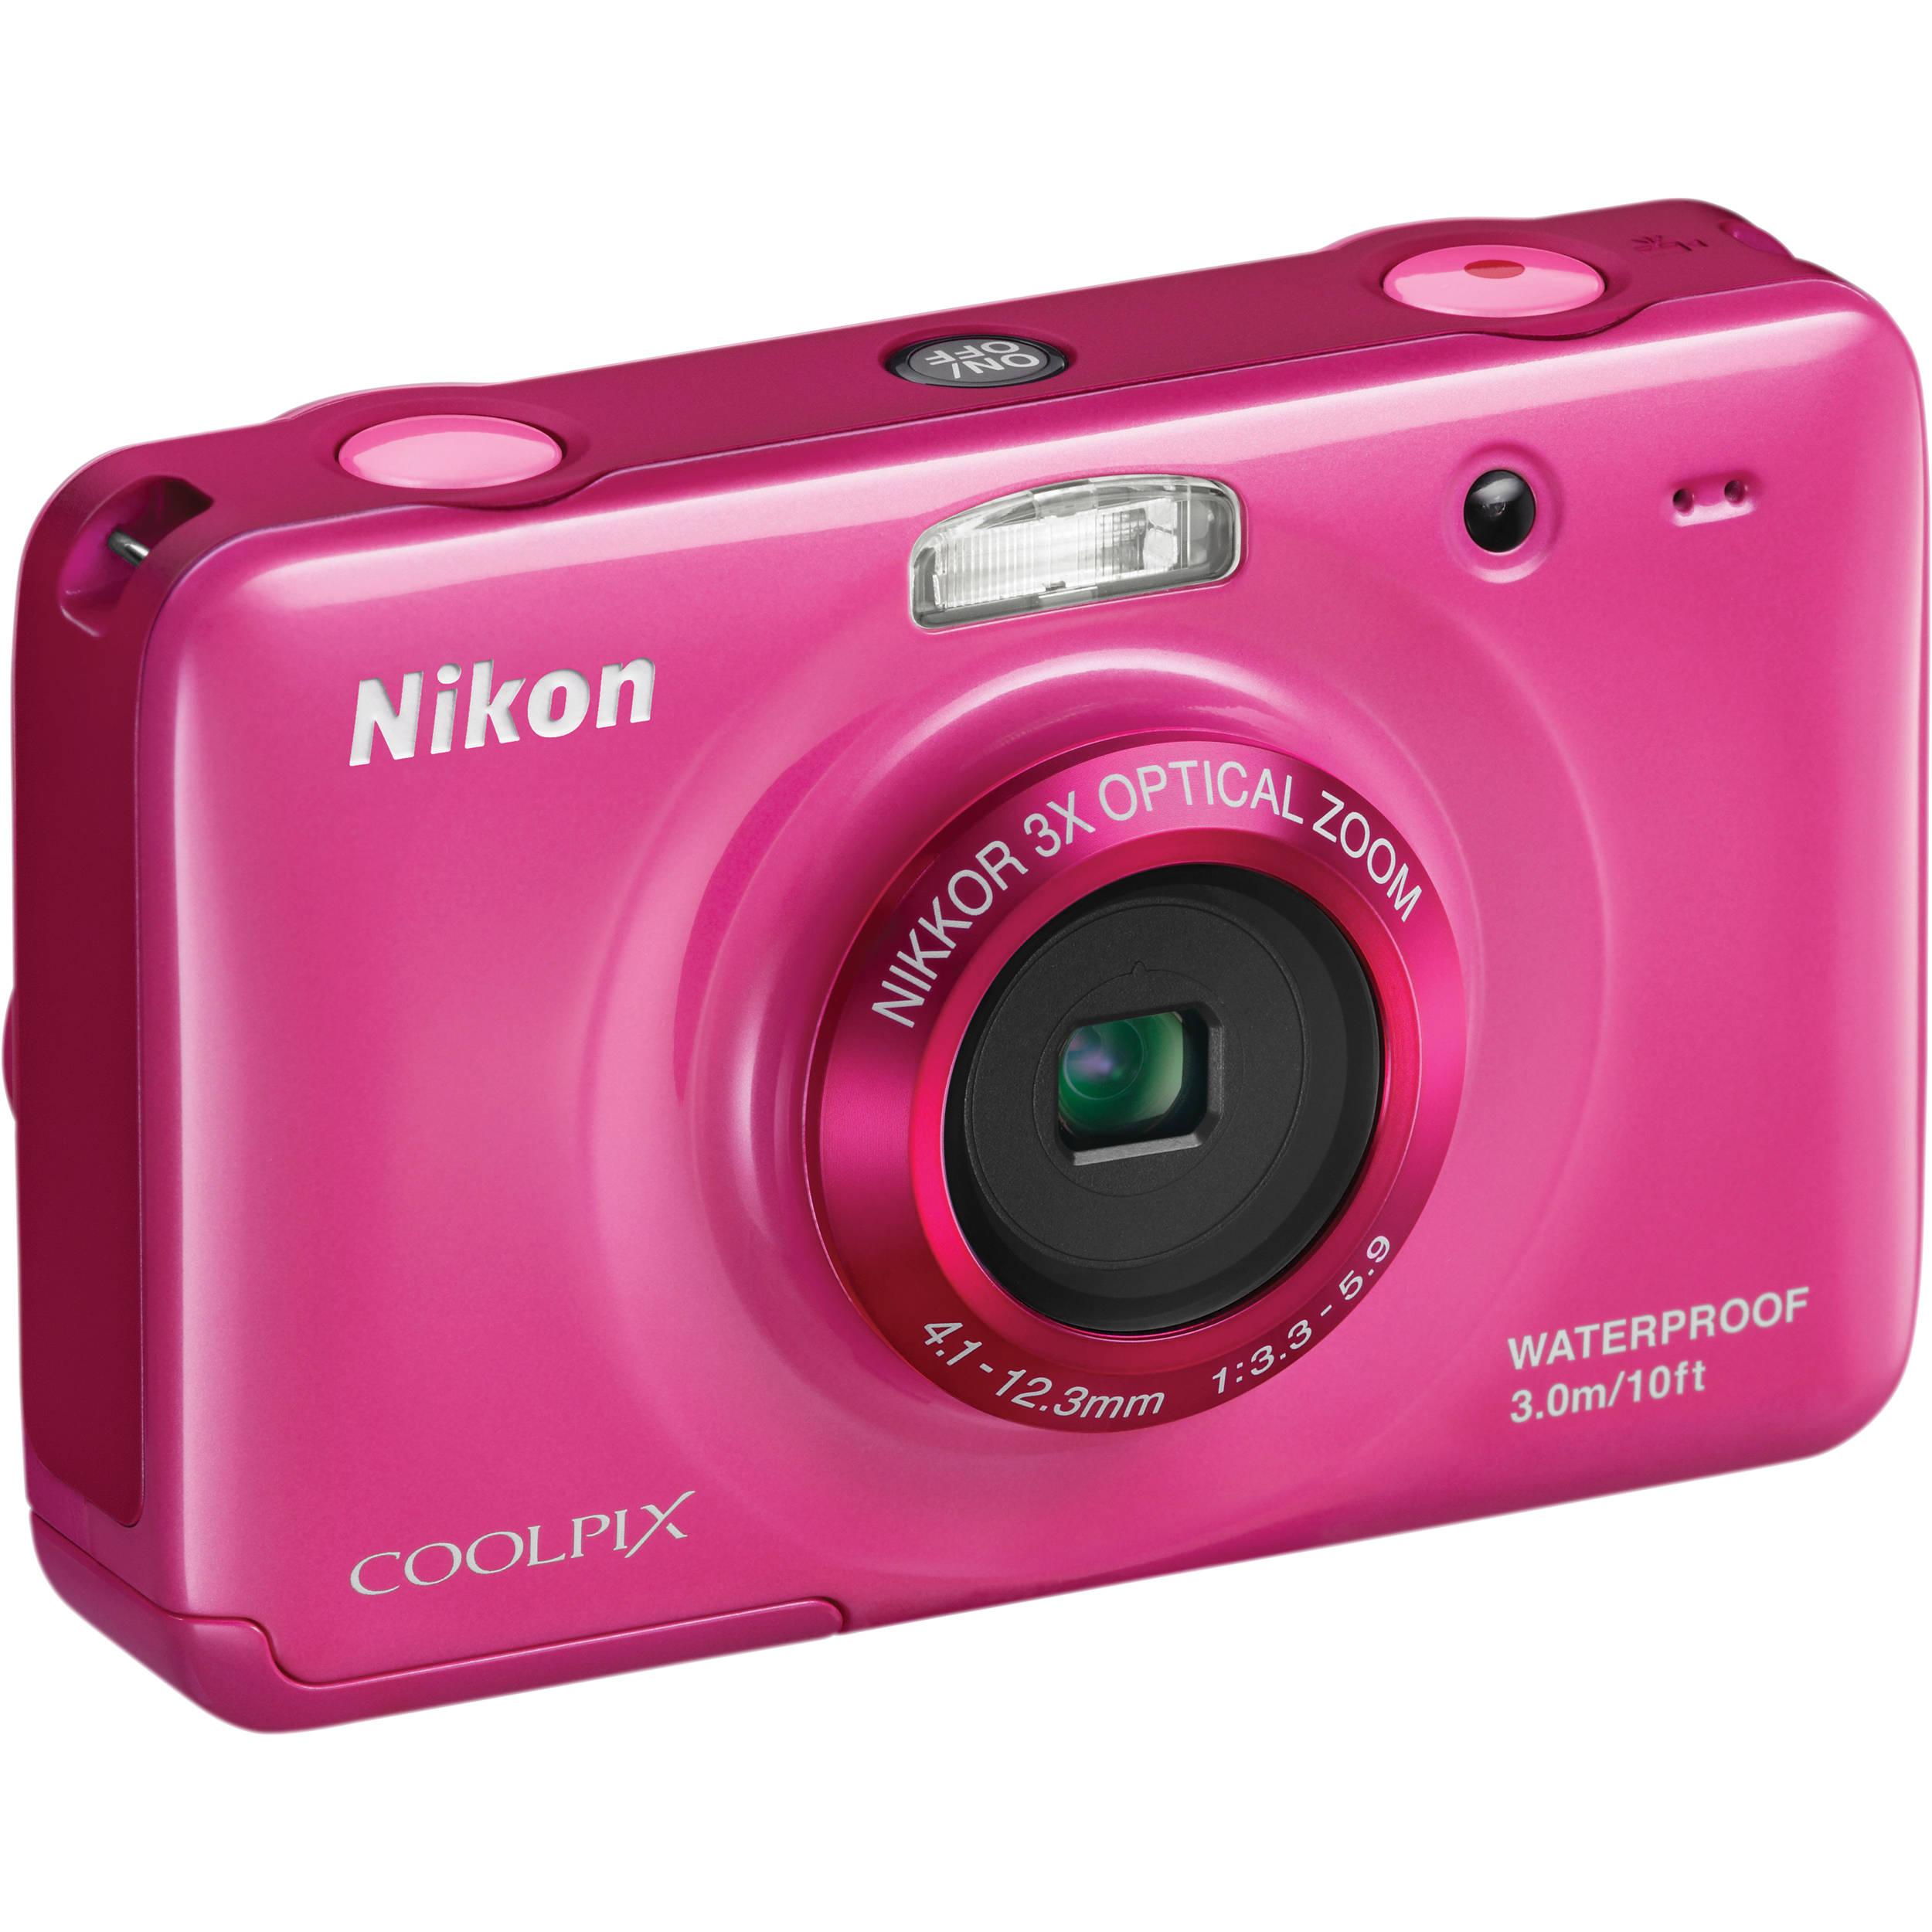 Nikon Coolpix S30 Digital Camera (Pink) 26318 B&H Photo Video